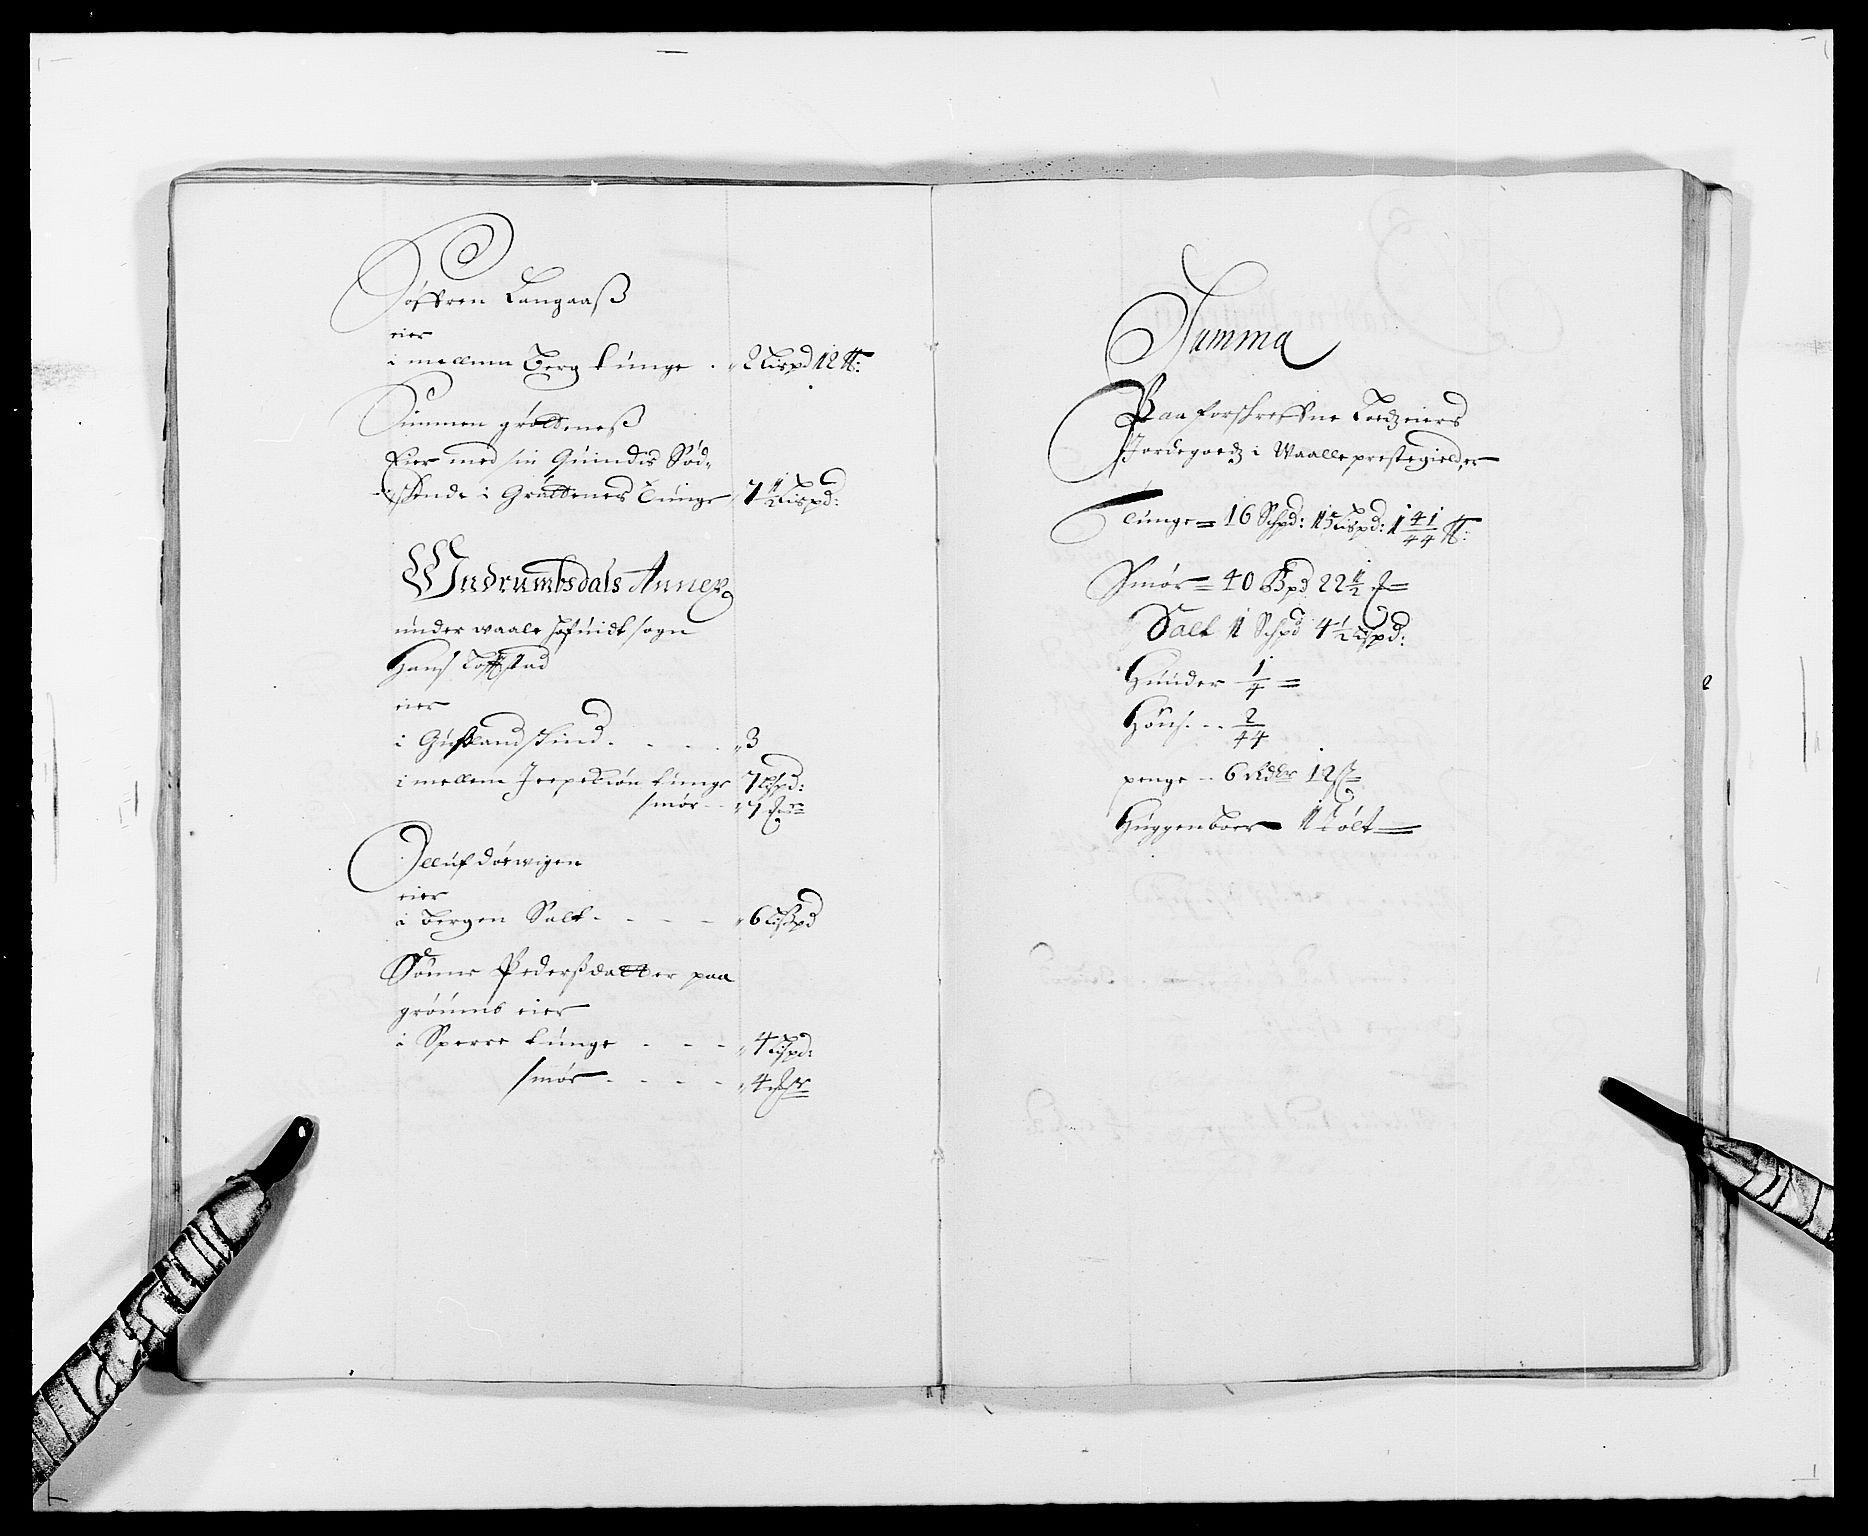 RA, Rentekammeret inntil 1814, Reviderte regnskaper, Fogderegnskap, R32/L1857: Fogderegnskap Jarlsberg grevskap, 1686-1690, s. 213